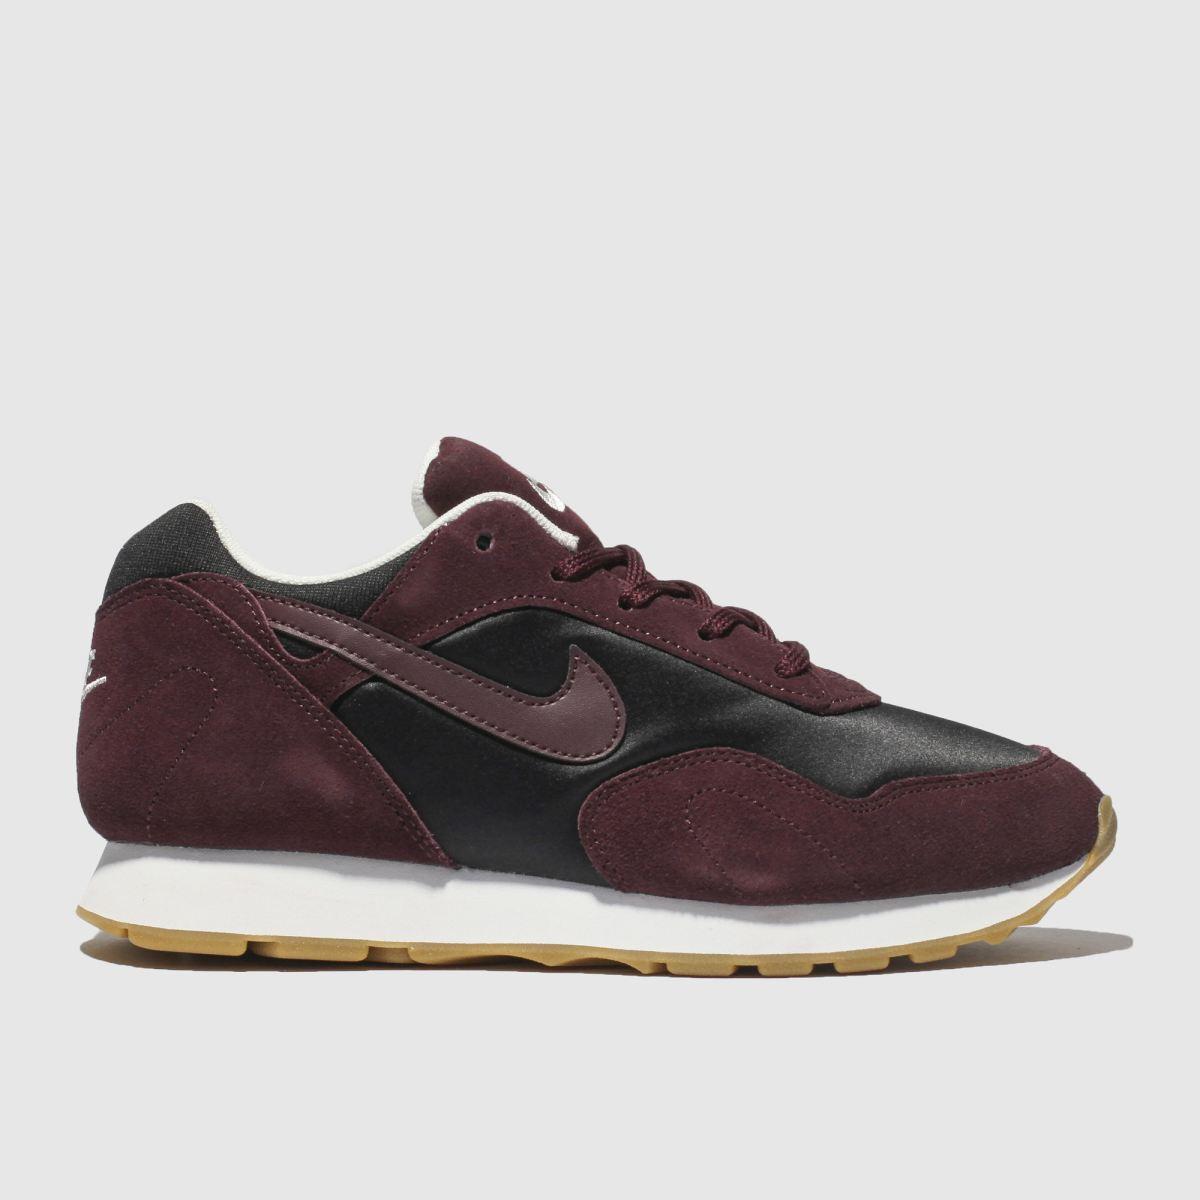 Nike Burgundy Outburst Trainers